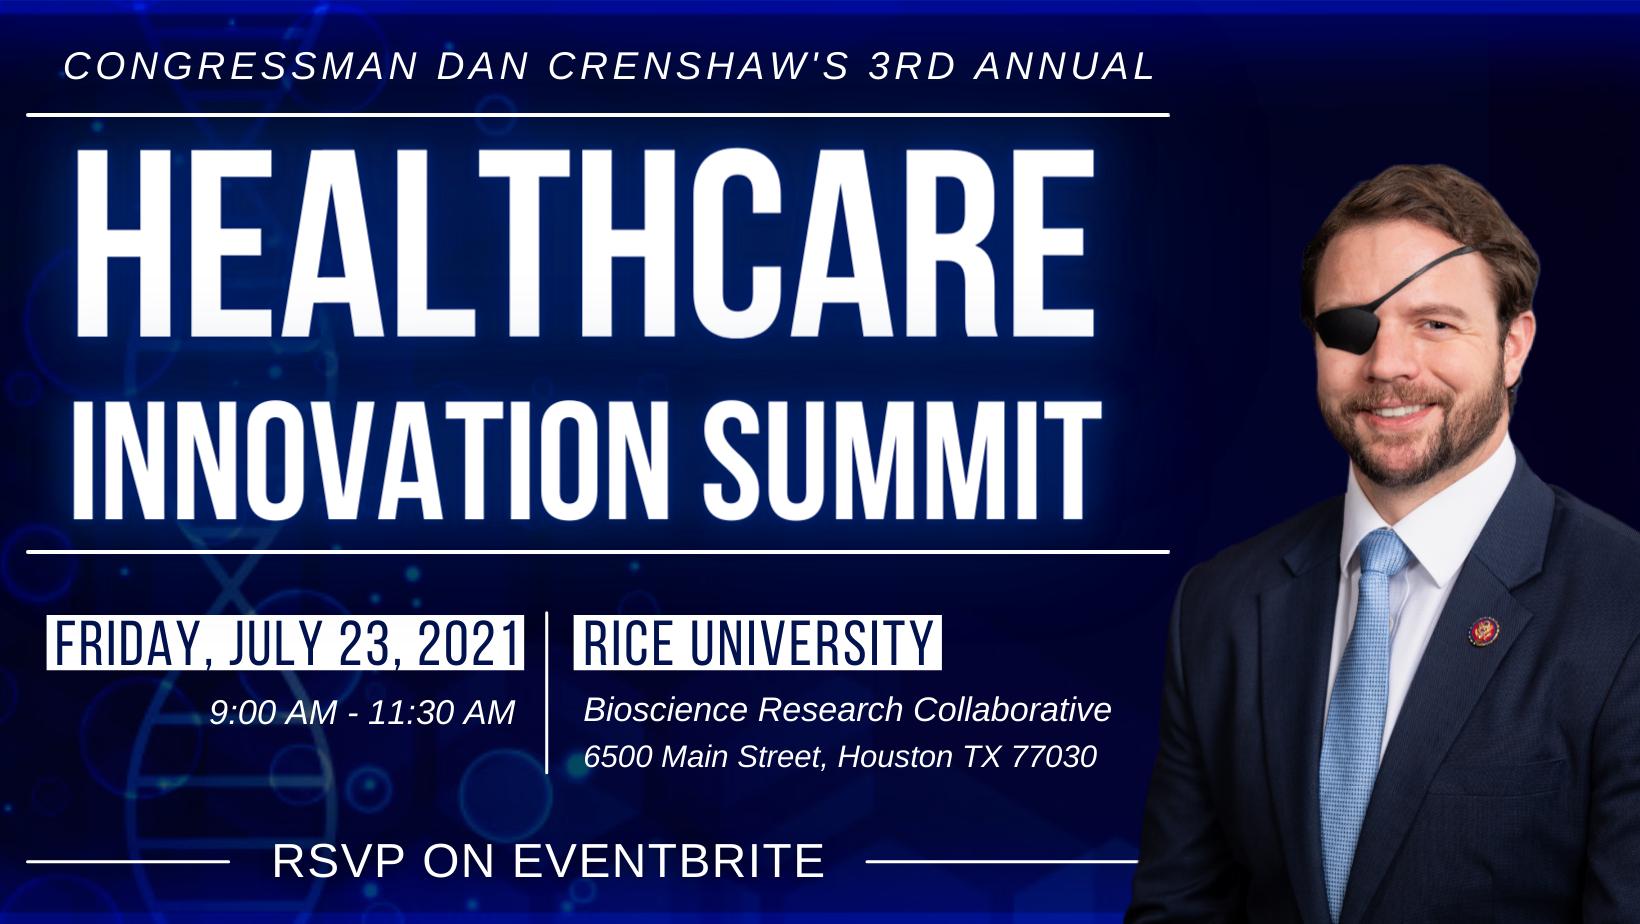 Spark CEO To Speak At Crenshaw Healthcare Innovation Summit